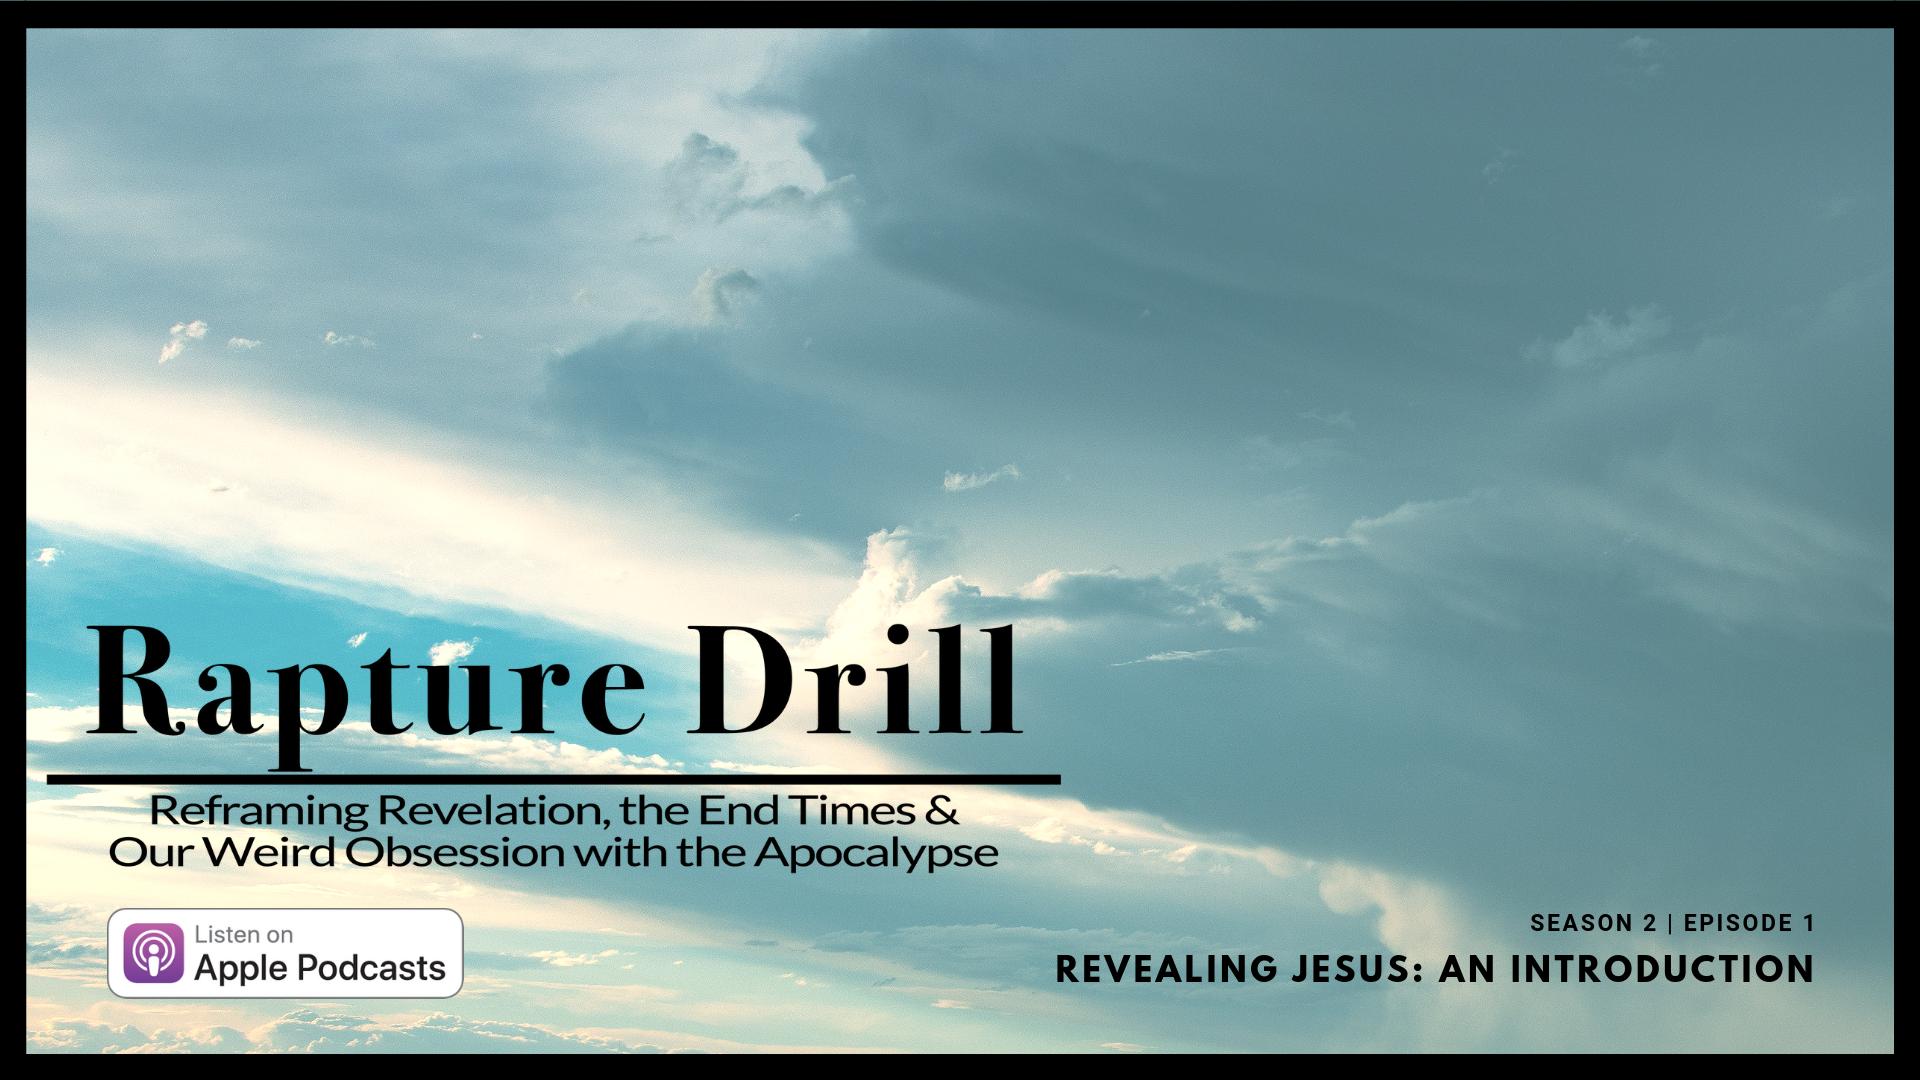 Artwork for Revealing Jesus in Revelation (Introduction) | S2 E1